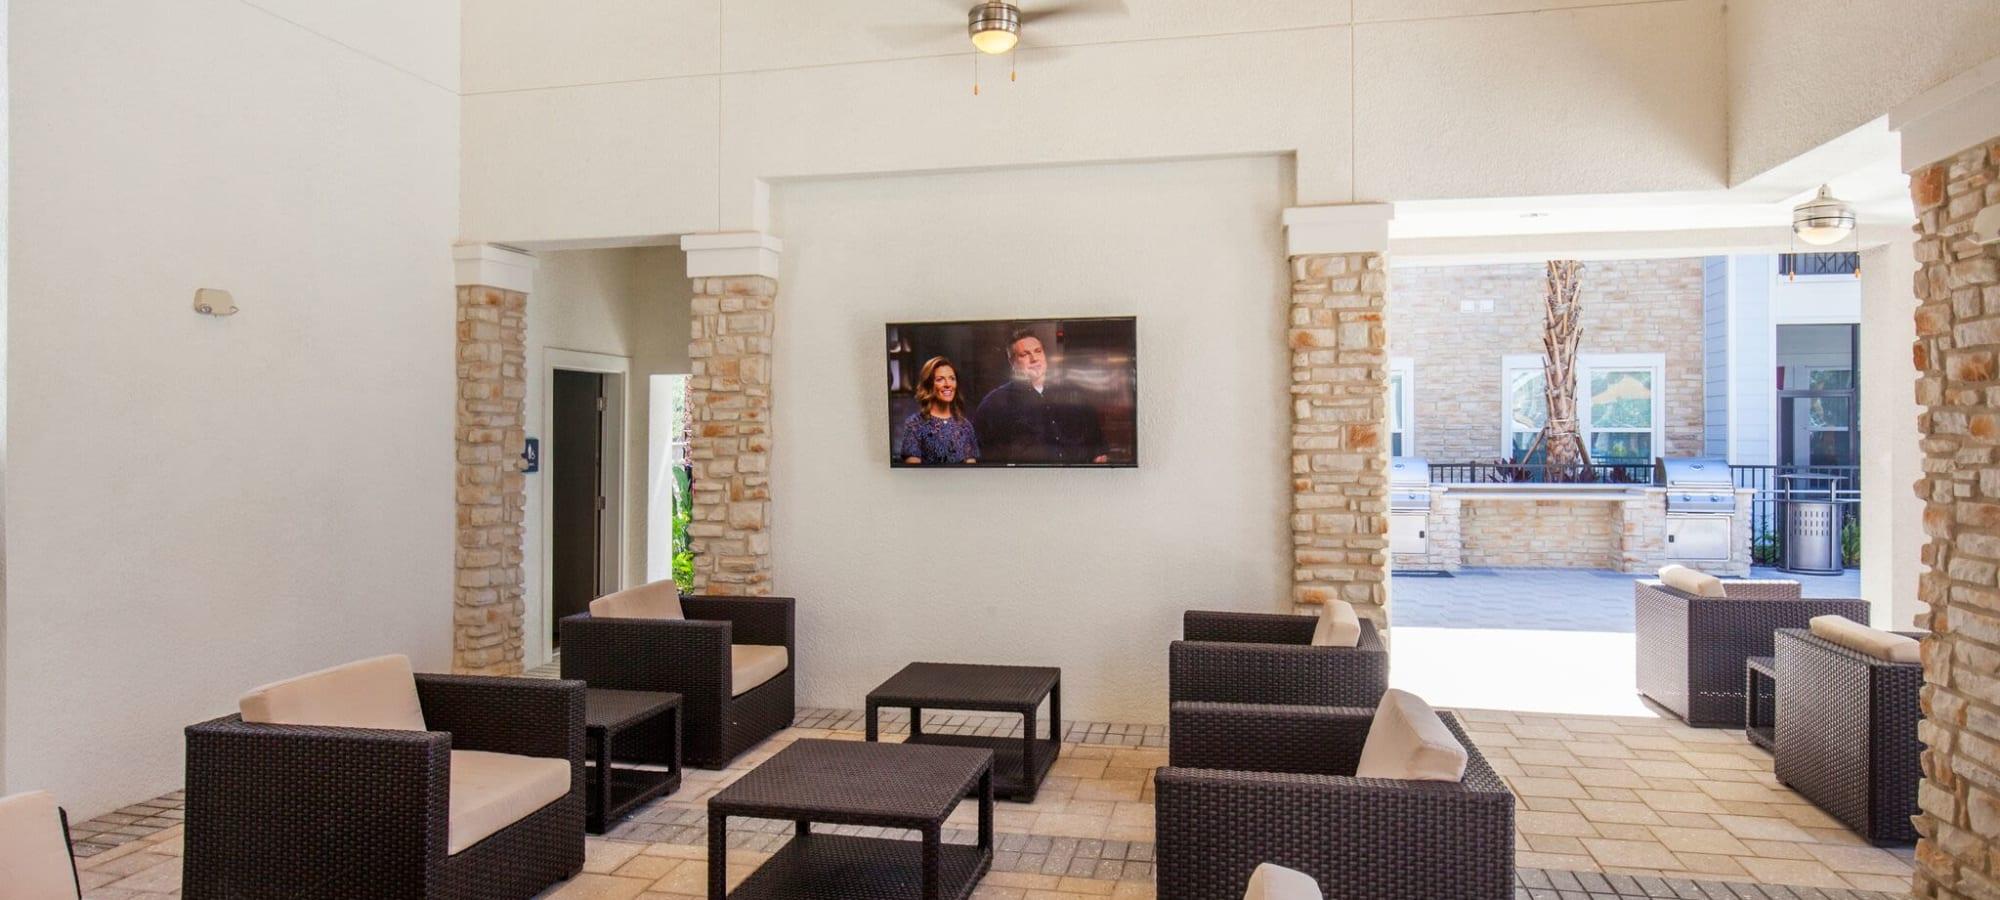 Linden Audubon Park apartments in Orlando, Florida